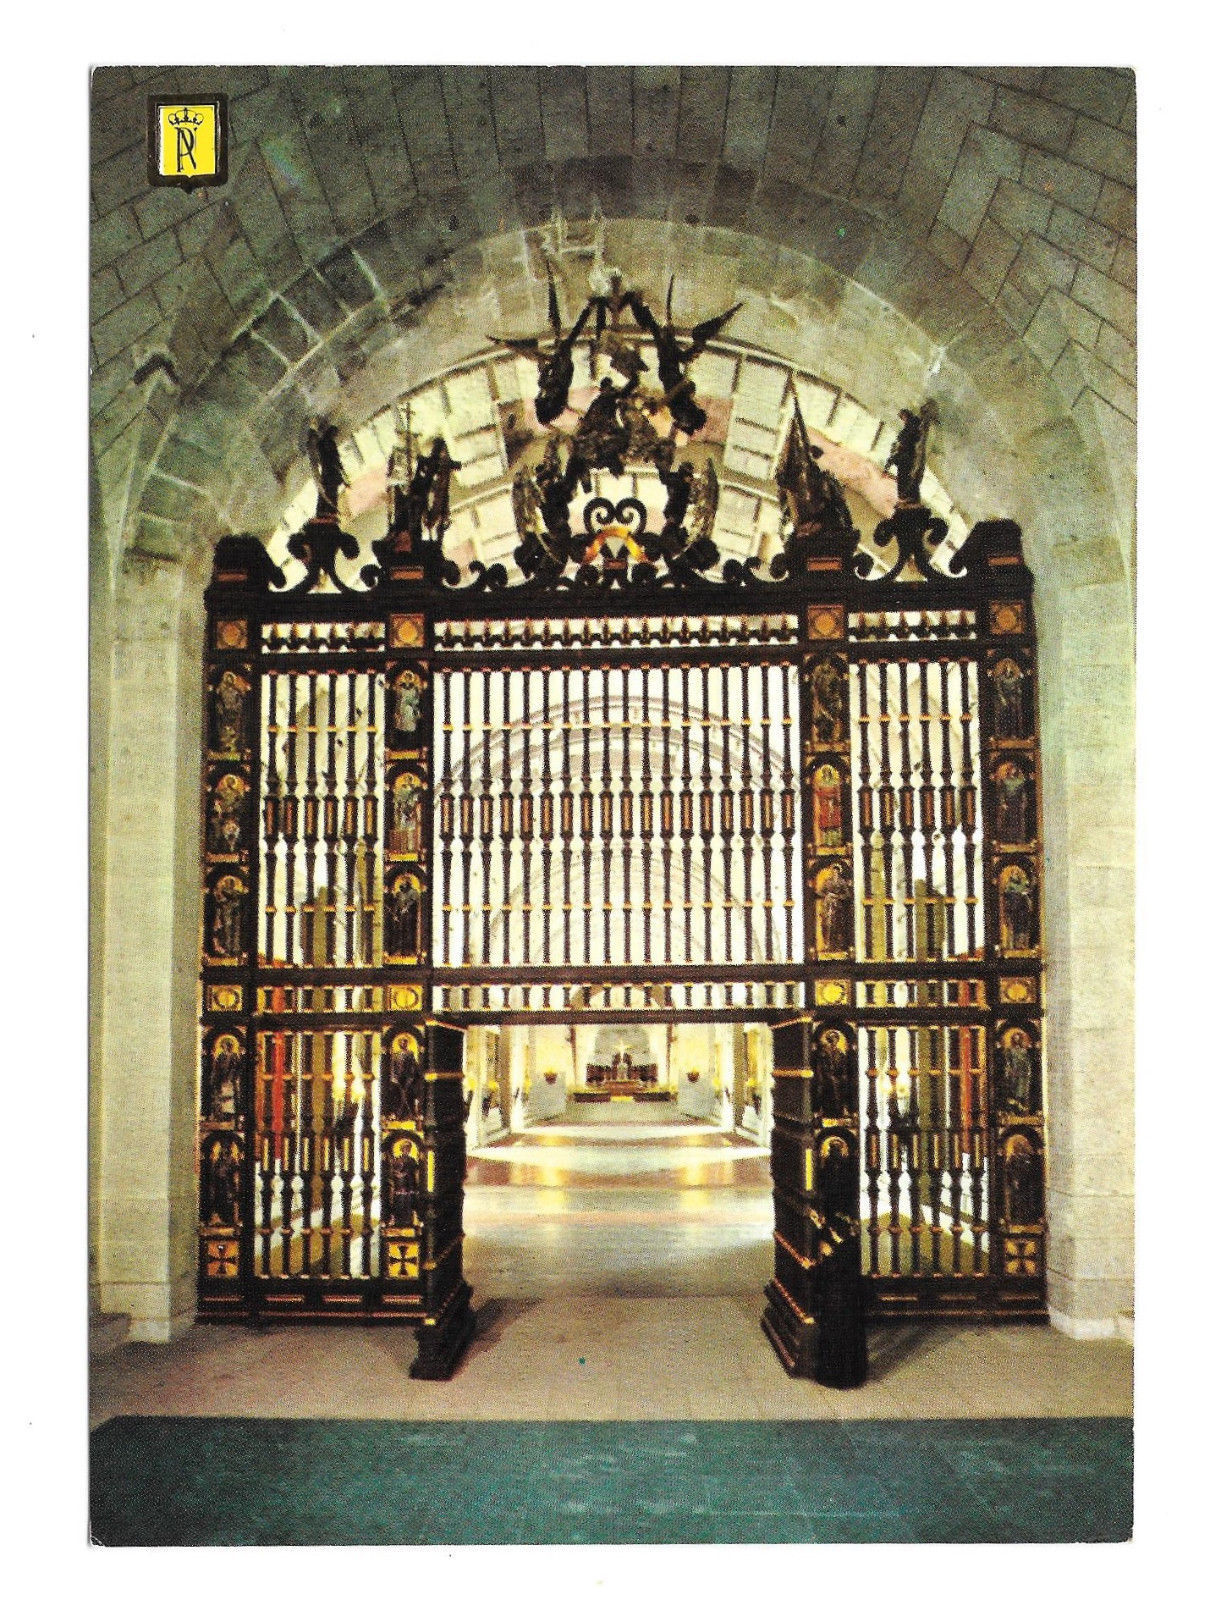 Spain Santa Cruz Valle de Los Caidos Iron Gate Crypt Church Vtg Postcard 4X6